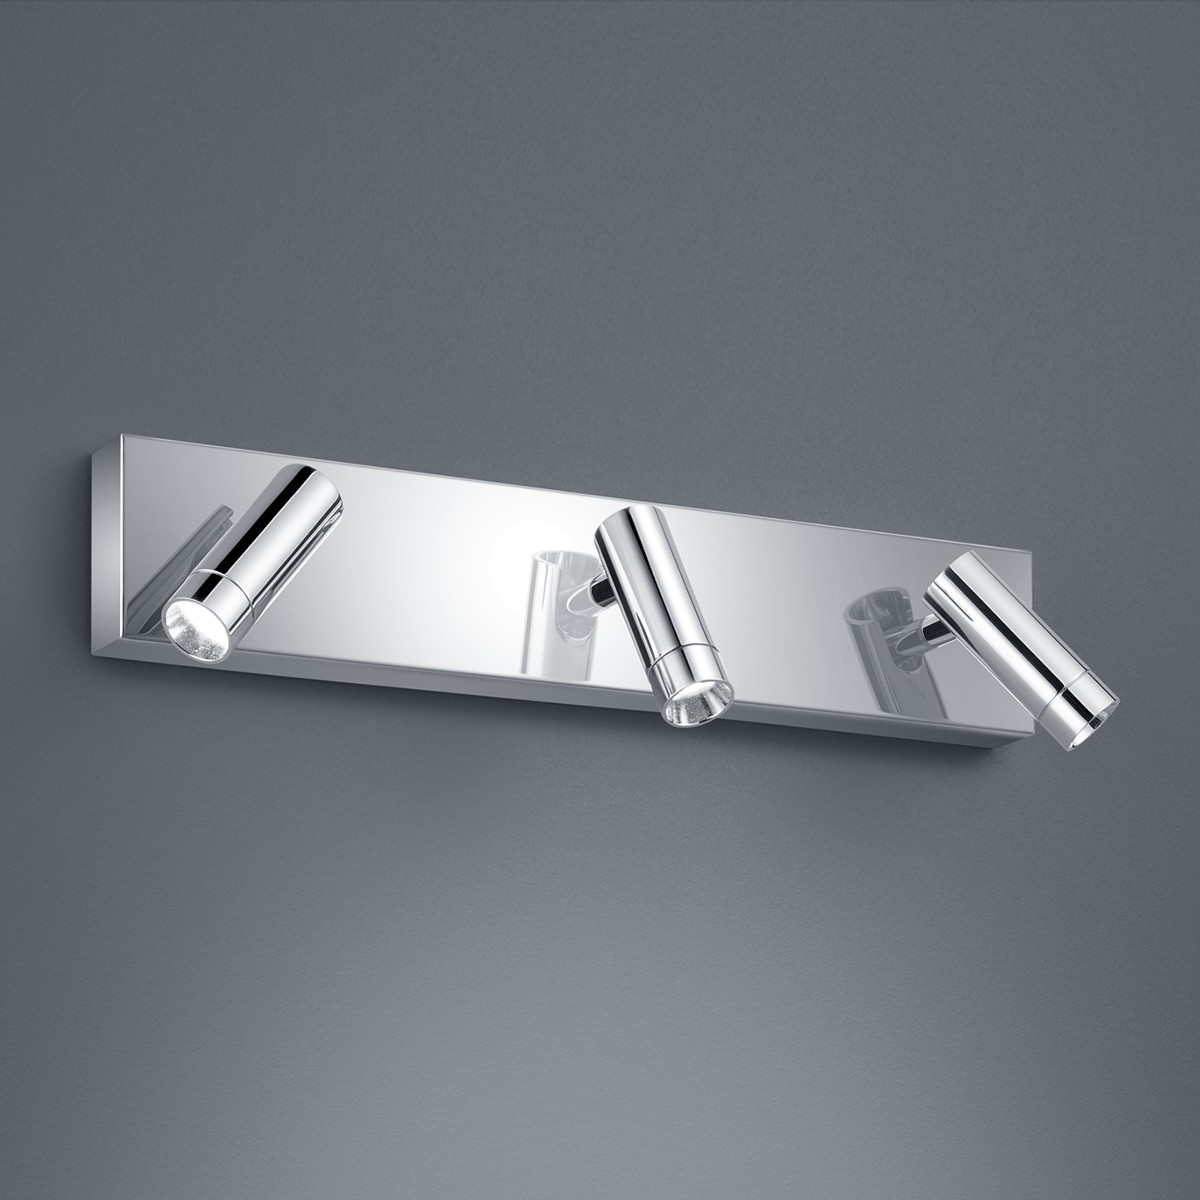 Helestra Zap Wand- / Deckenleuchte, 3-flg., Chrom